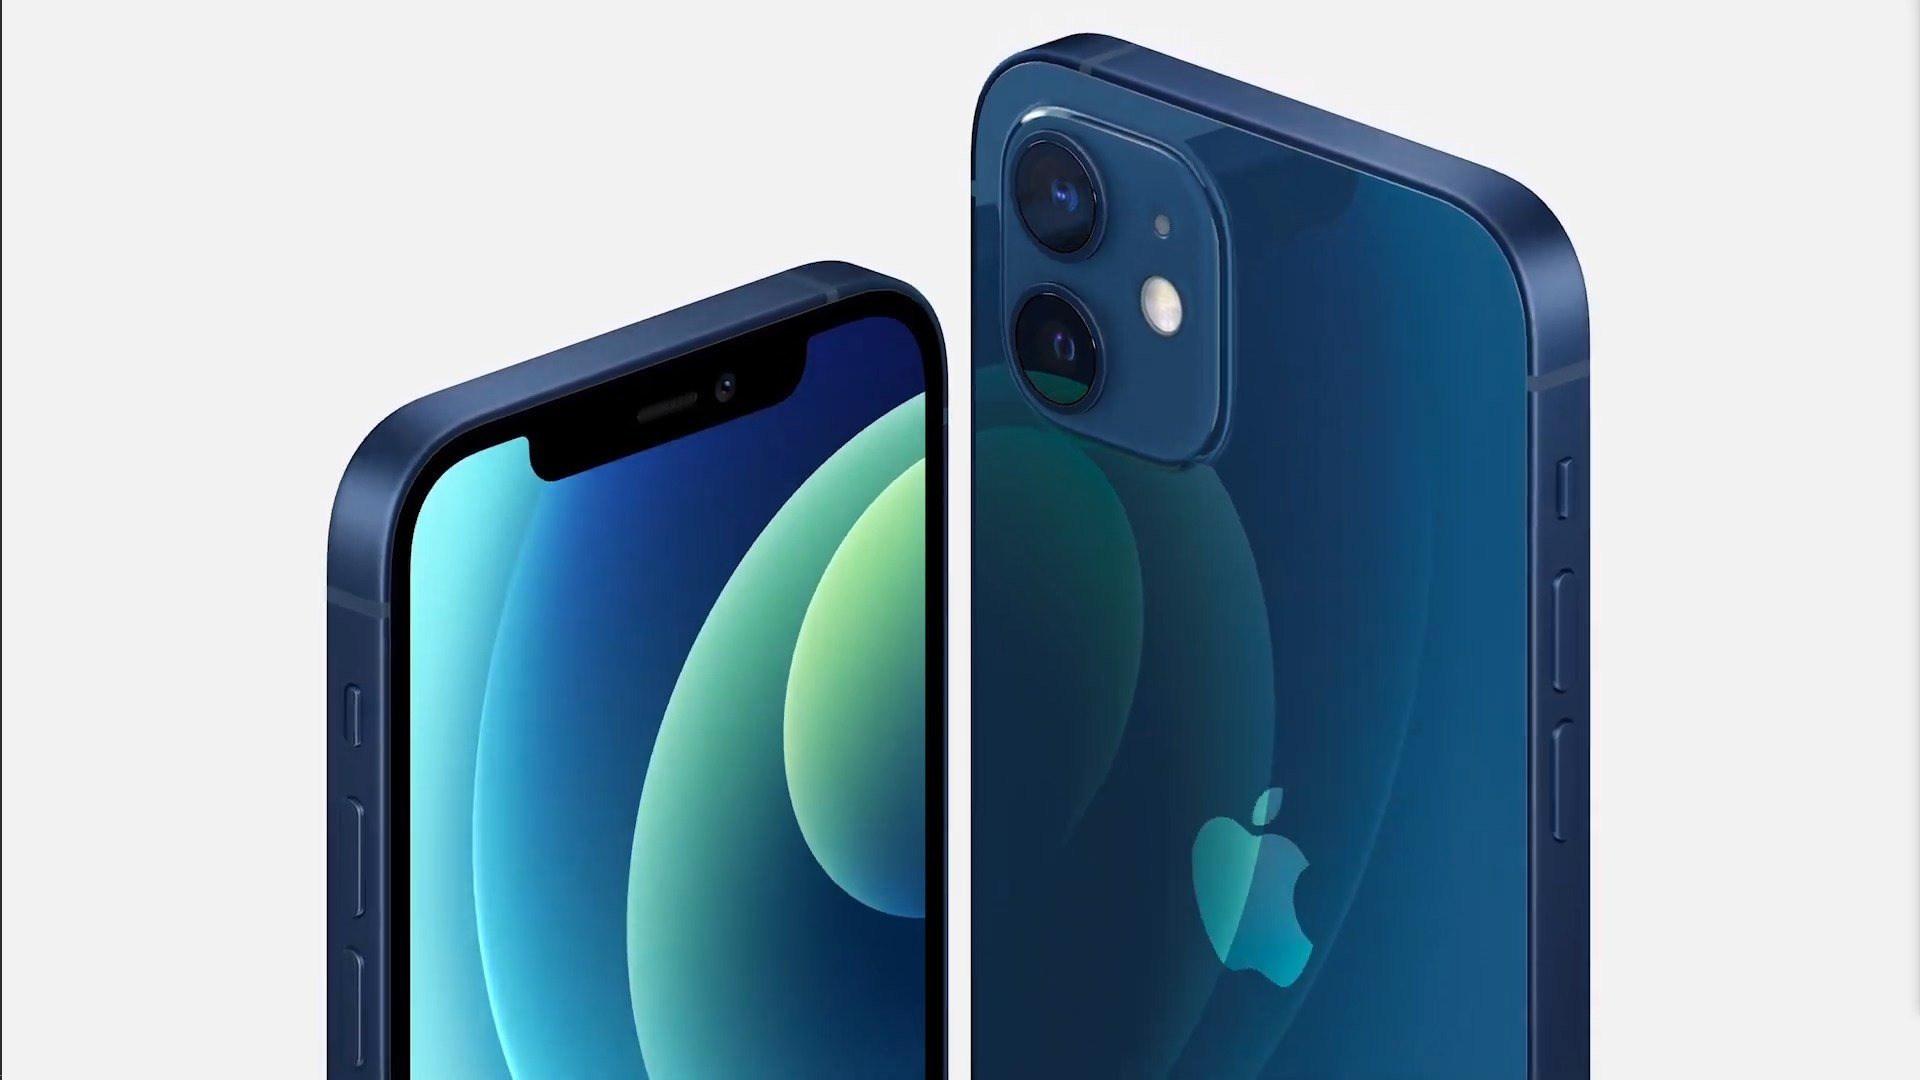 Smartphone, Apple, Iphone, iPhone 12, iPhone 12 Mini